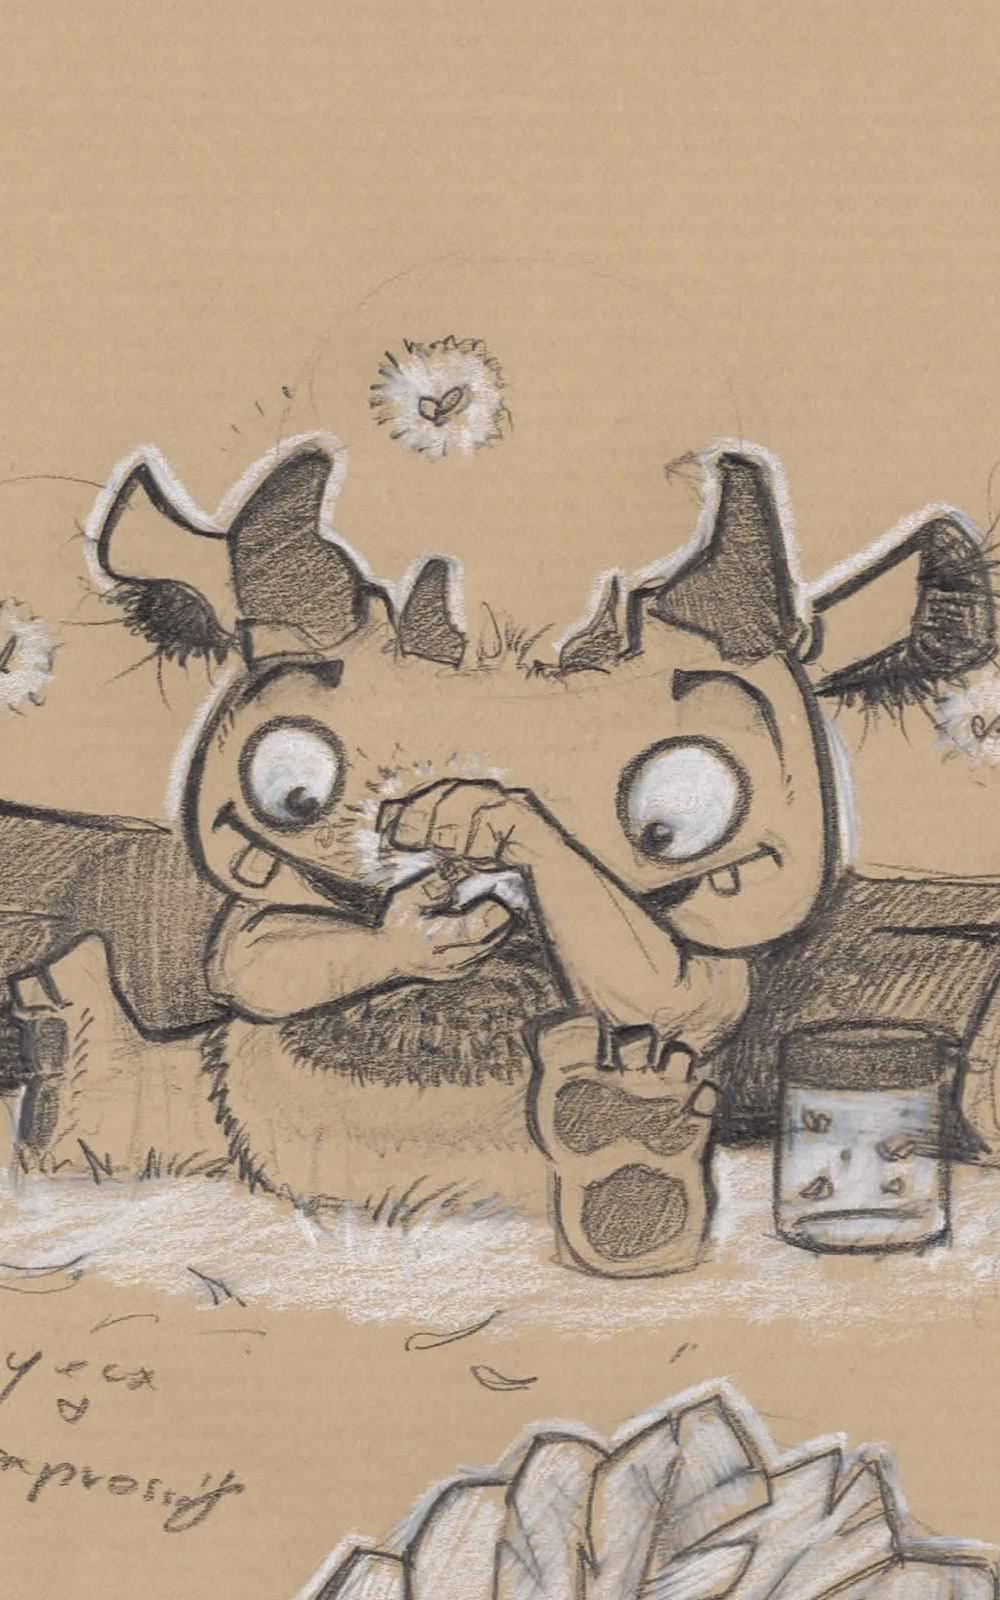 critter Smile positif 4 sketch